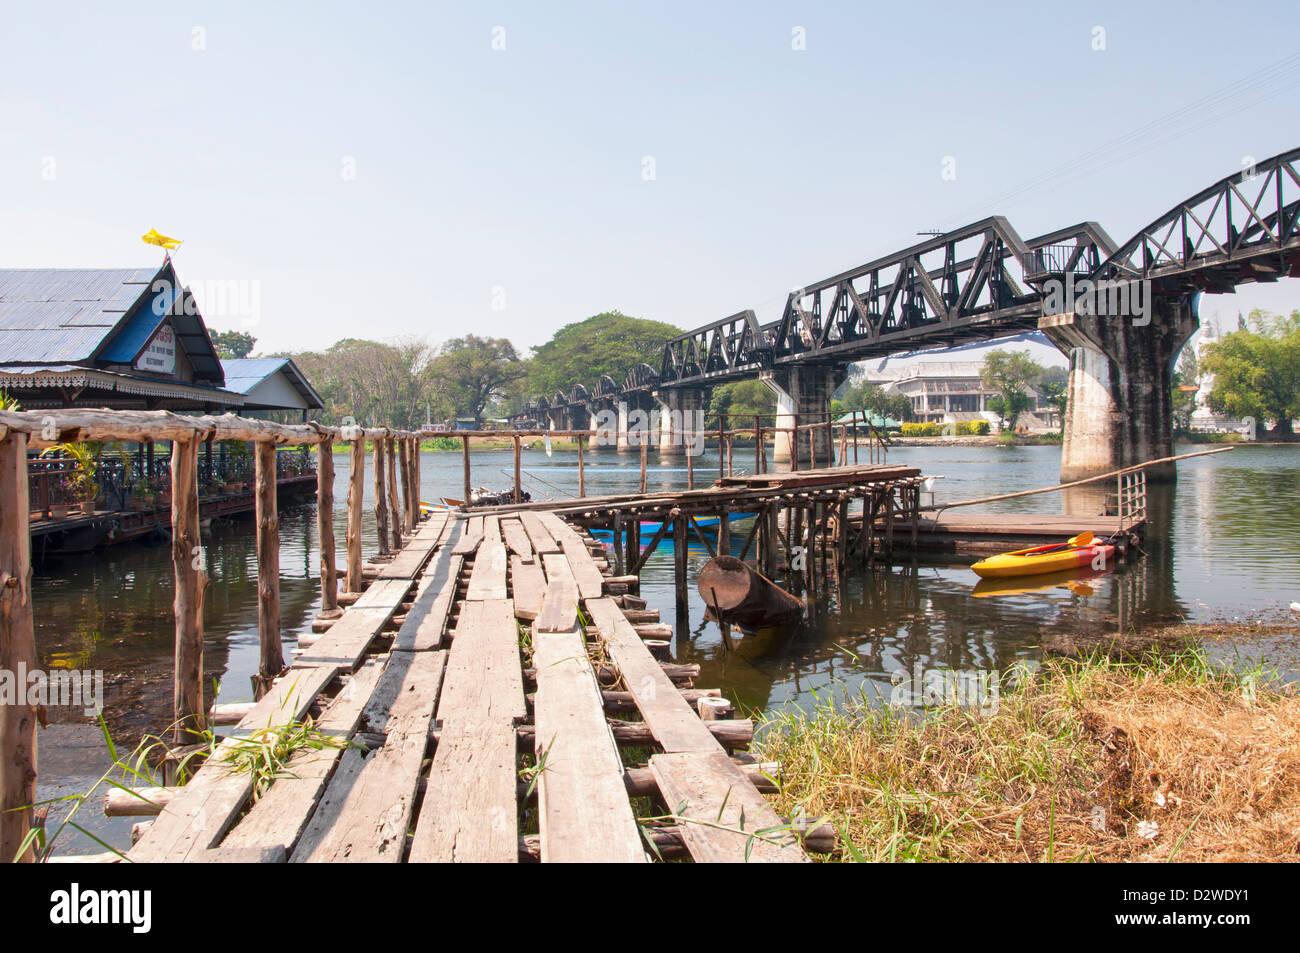 The bridge over river Kwai - Stock Image